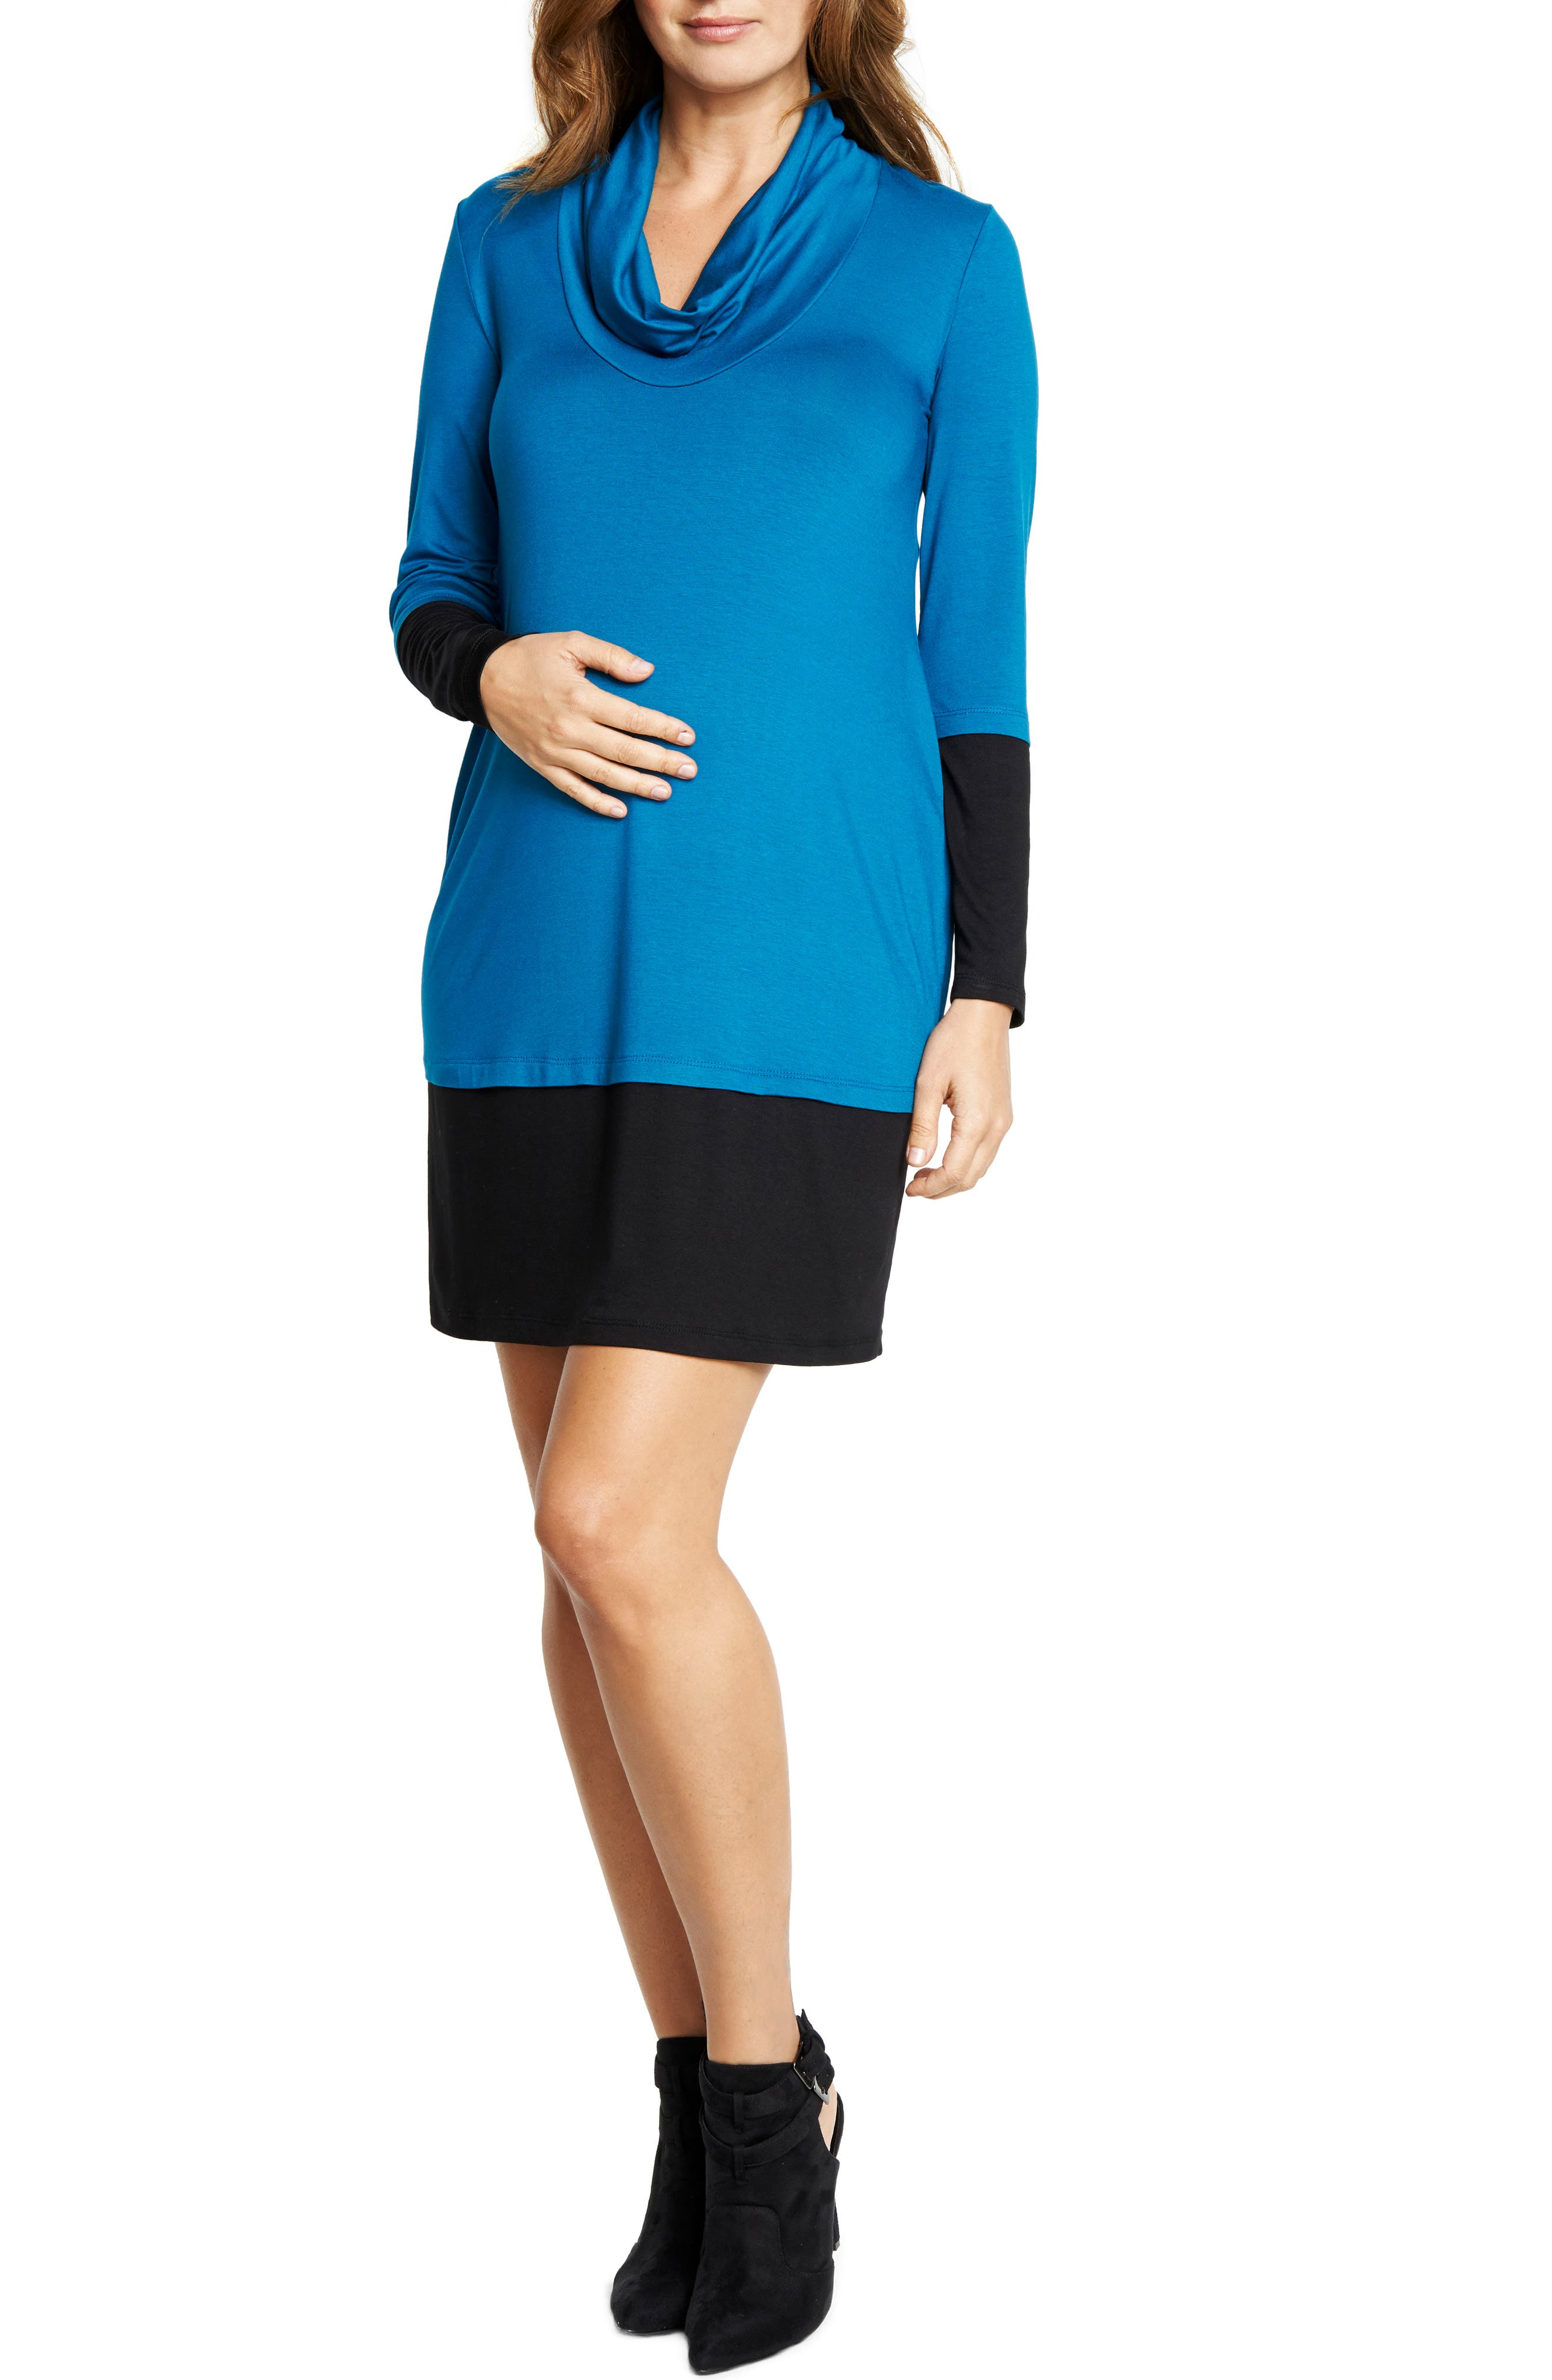 Cowl Neck Maternity Dress,                         Main,                         color, TEAL/ BLACK